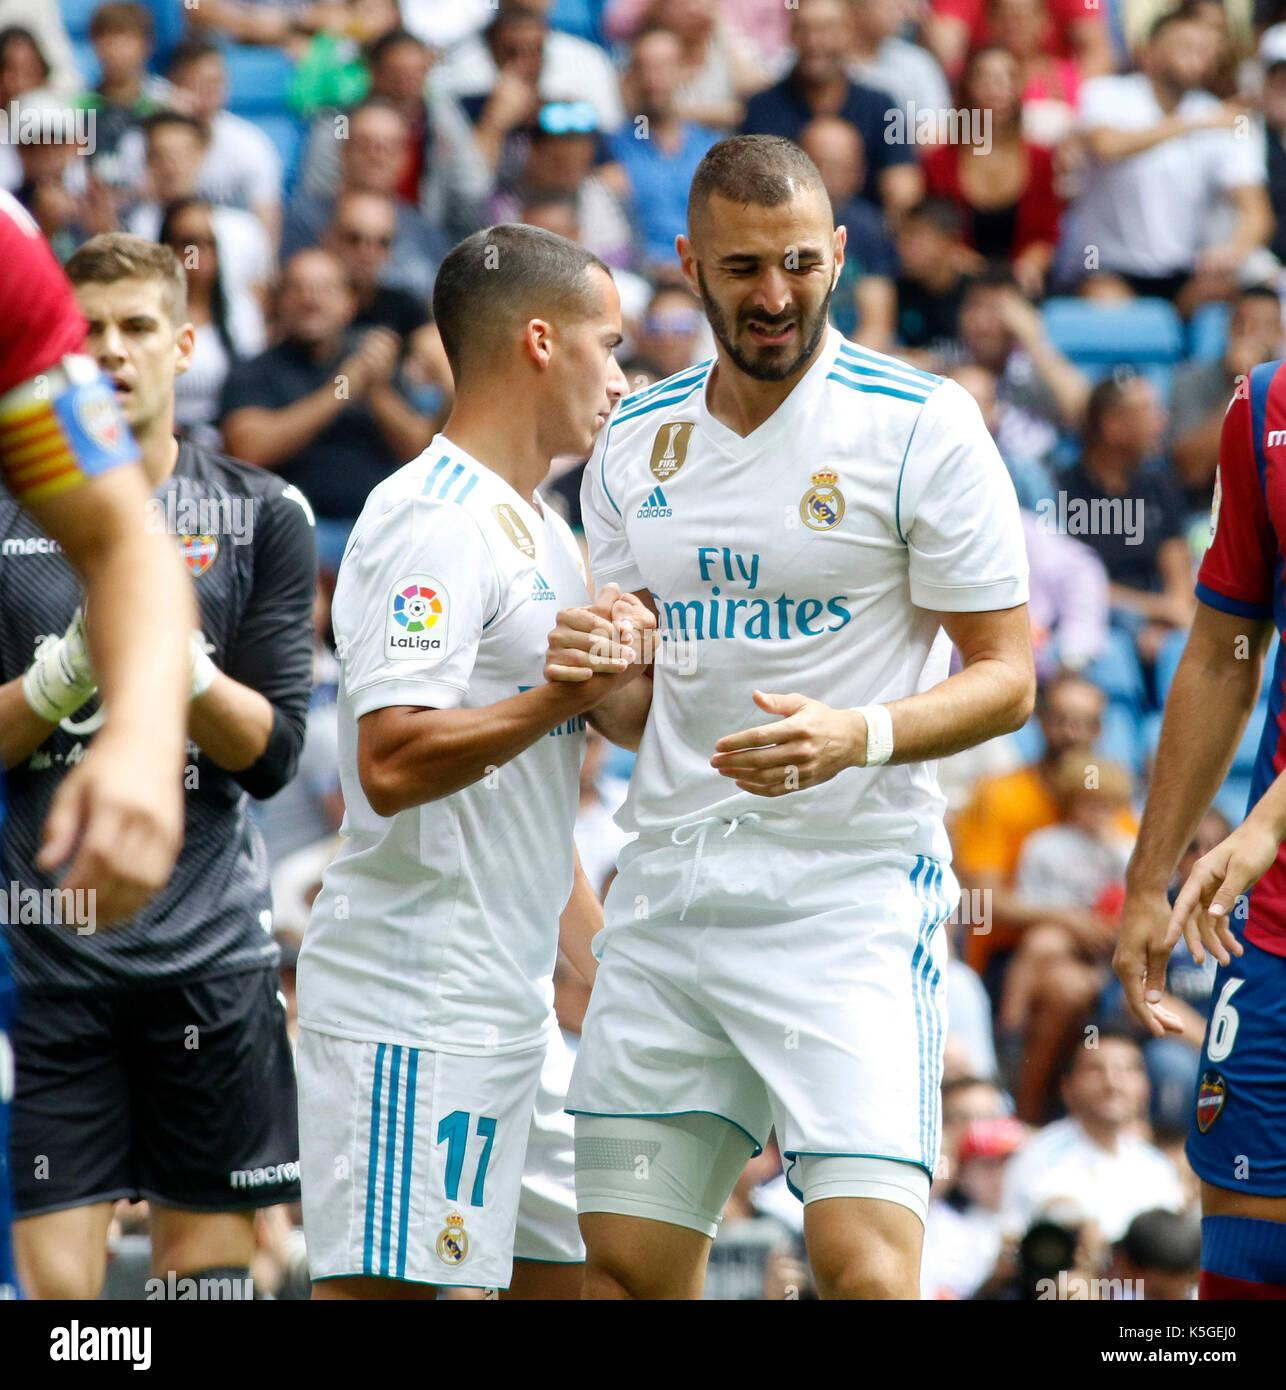 e6bdb40c1 09 Karim Benzema (Real Madrid) during the Spanish La Liga soccer match  between Real Madrid and Levante at the Santiago Bernabeu stadium in Madrid